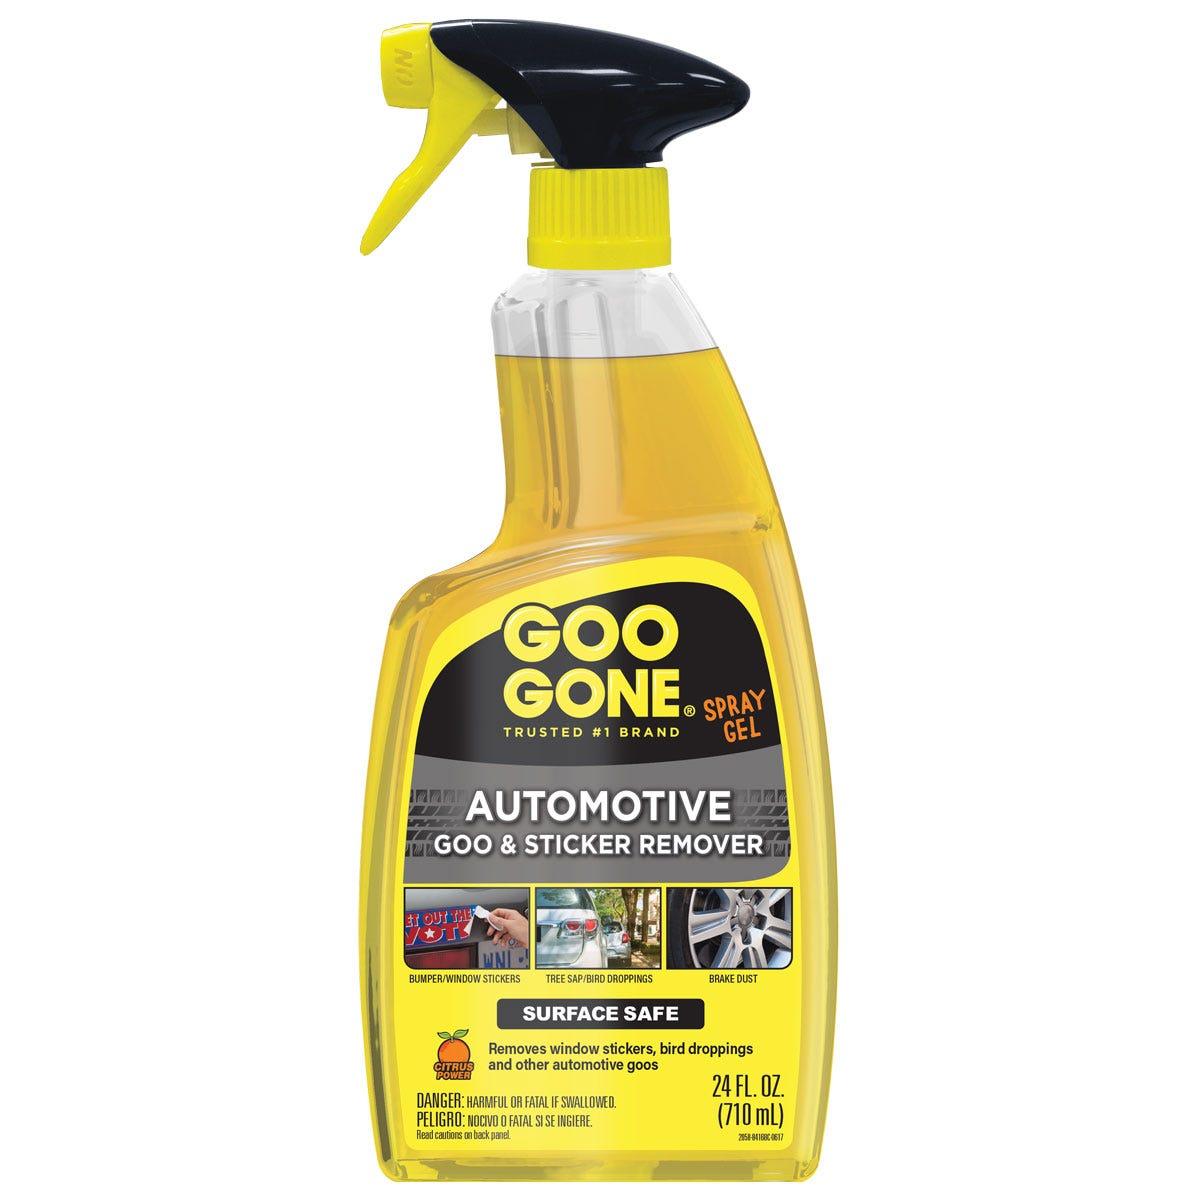 Automotive Goo & Sticker Remover